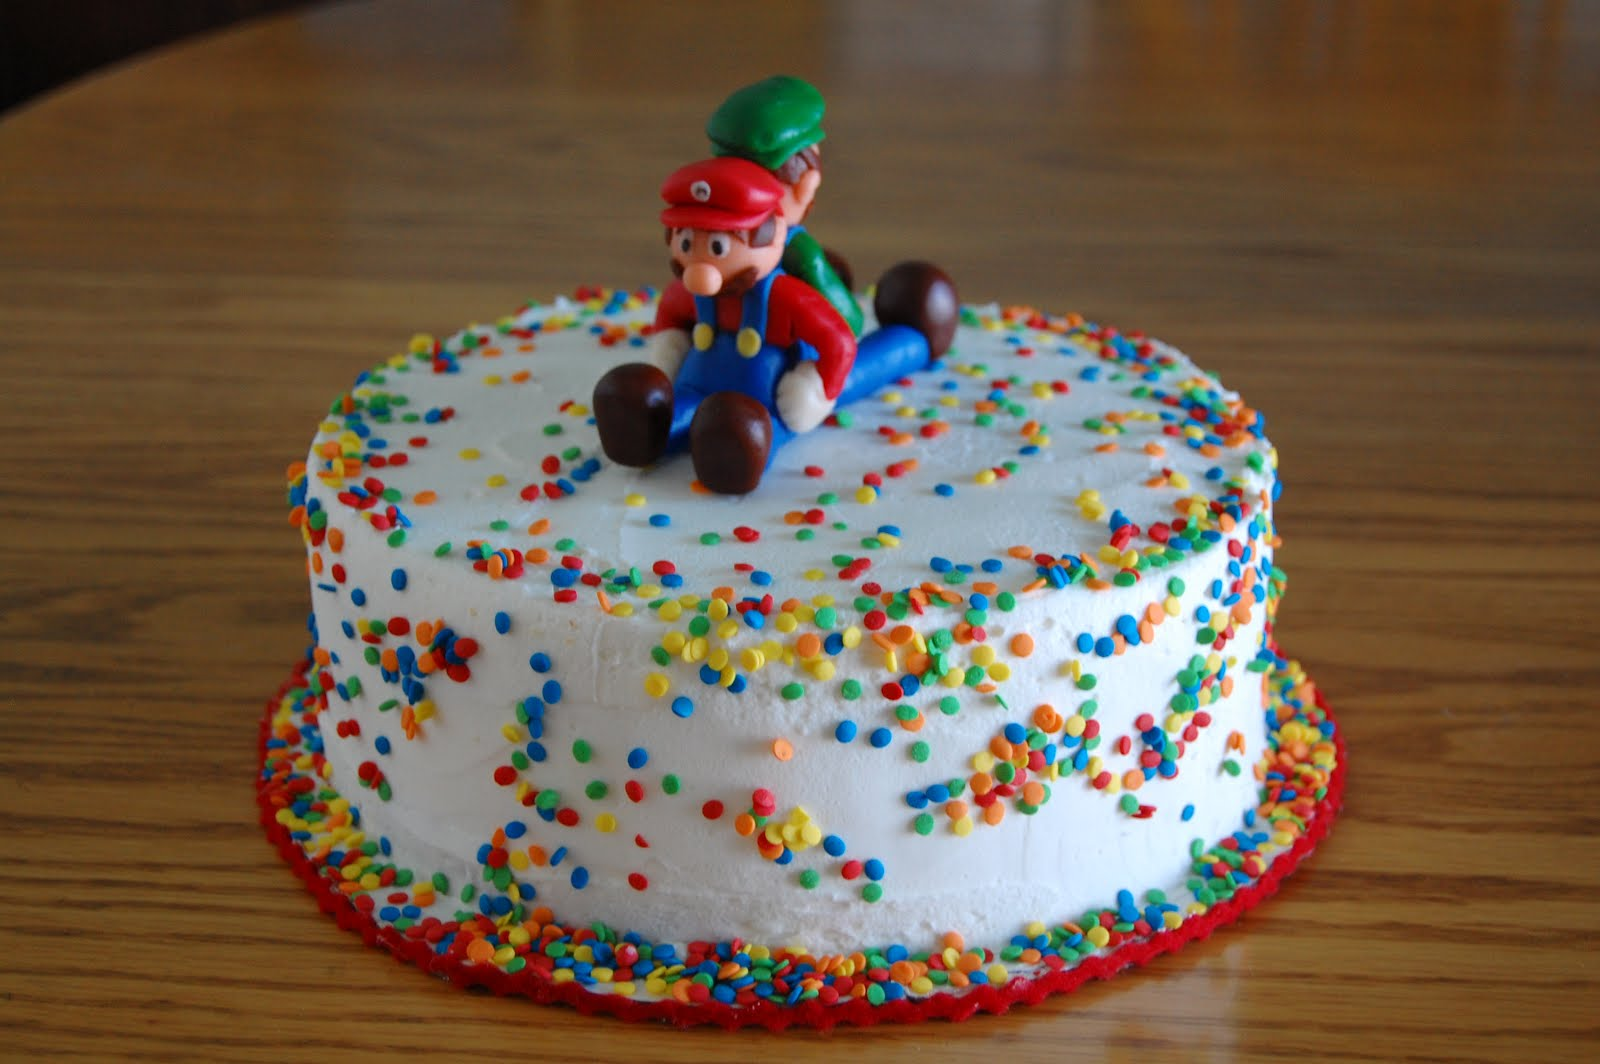 Ice Cream Cake Edible Image : Edible Elegance: Mario & Luigi Ice cream cake